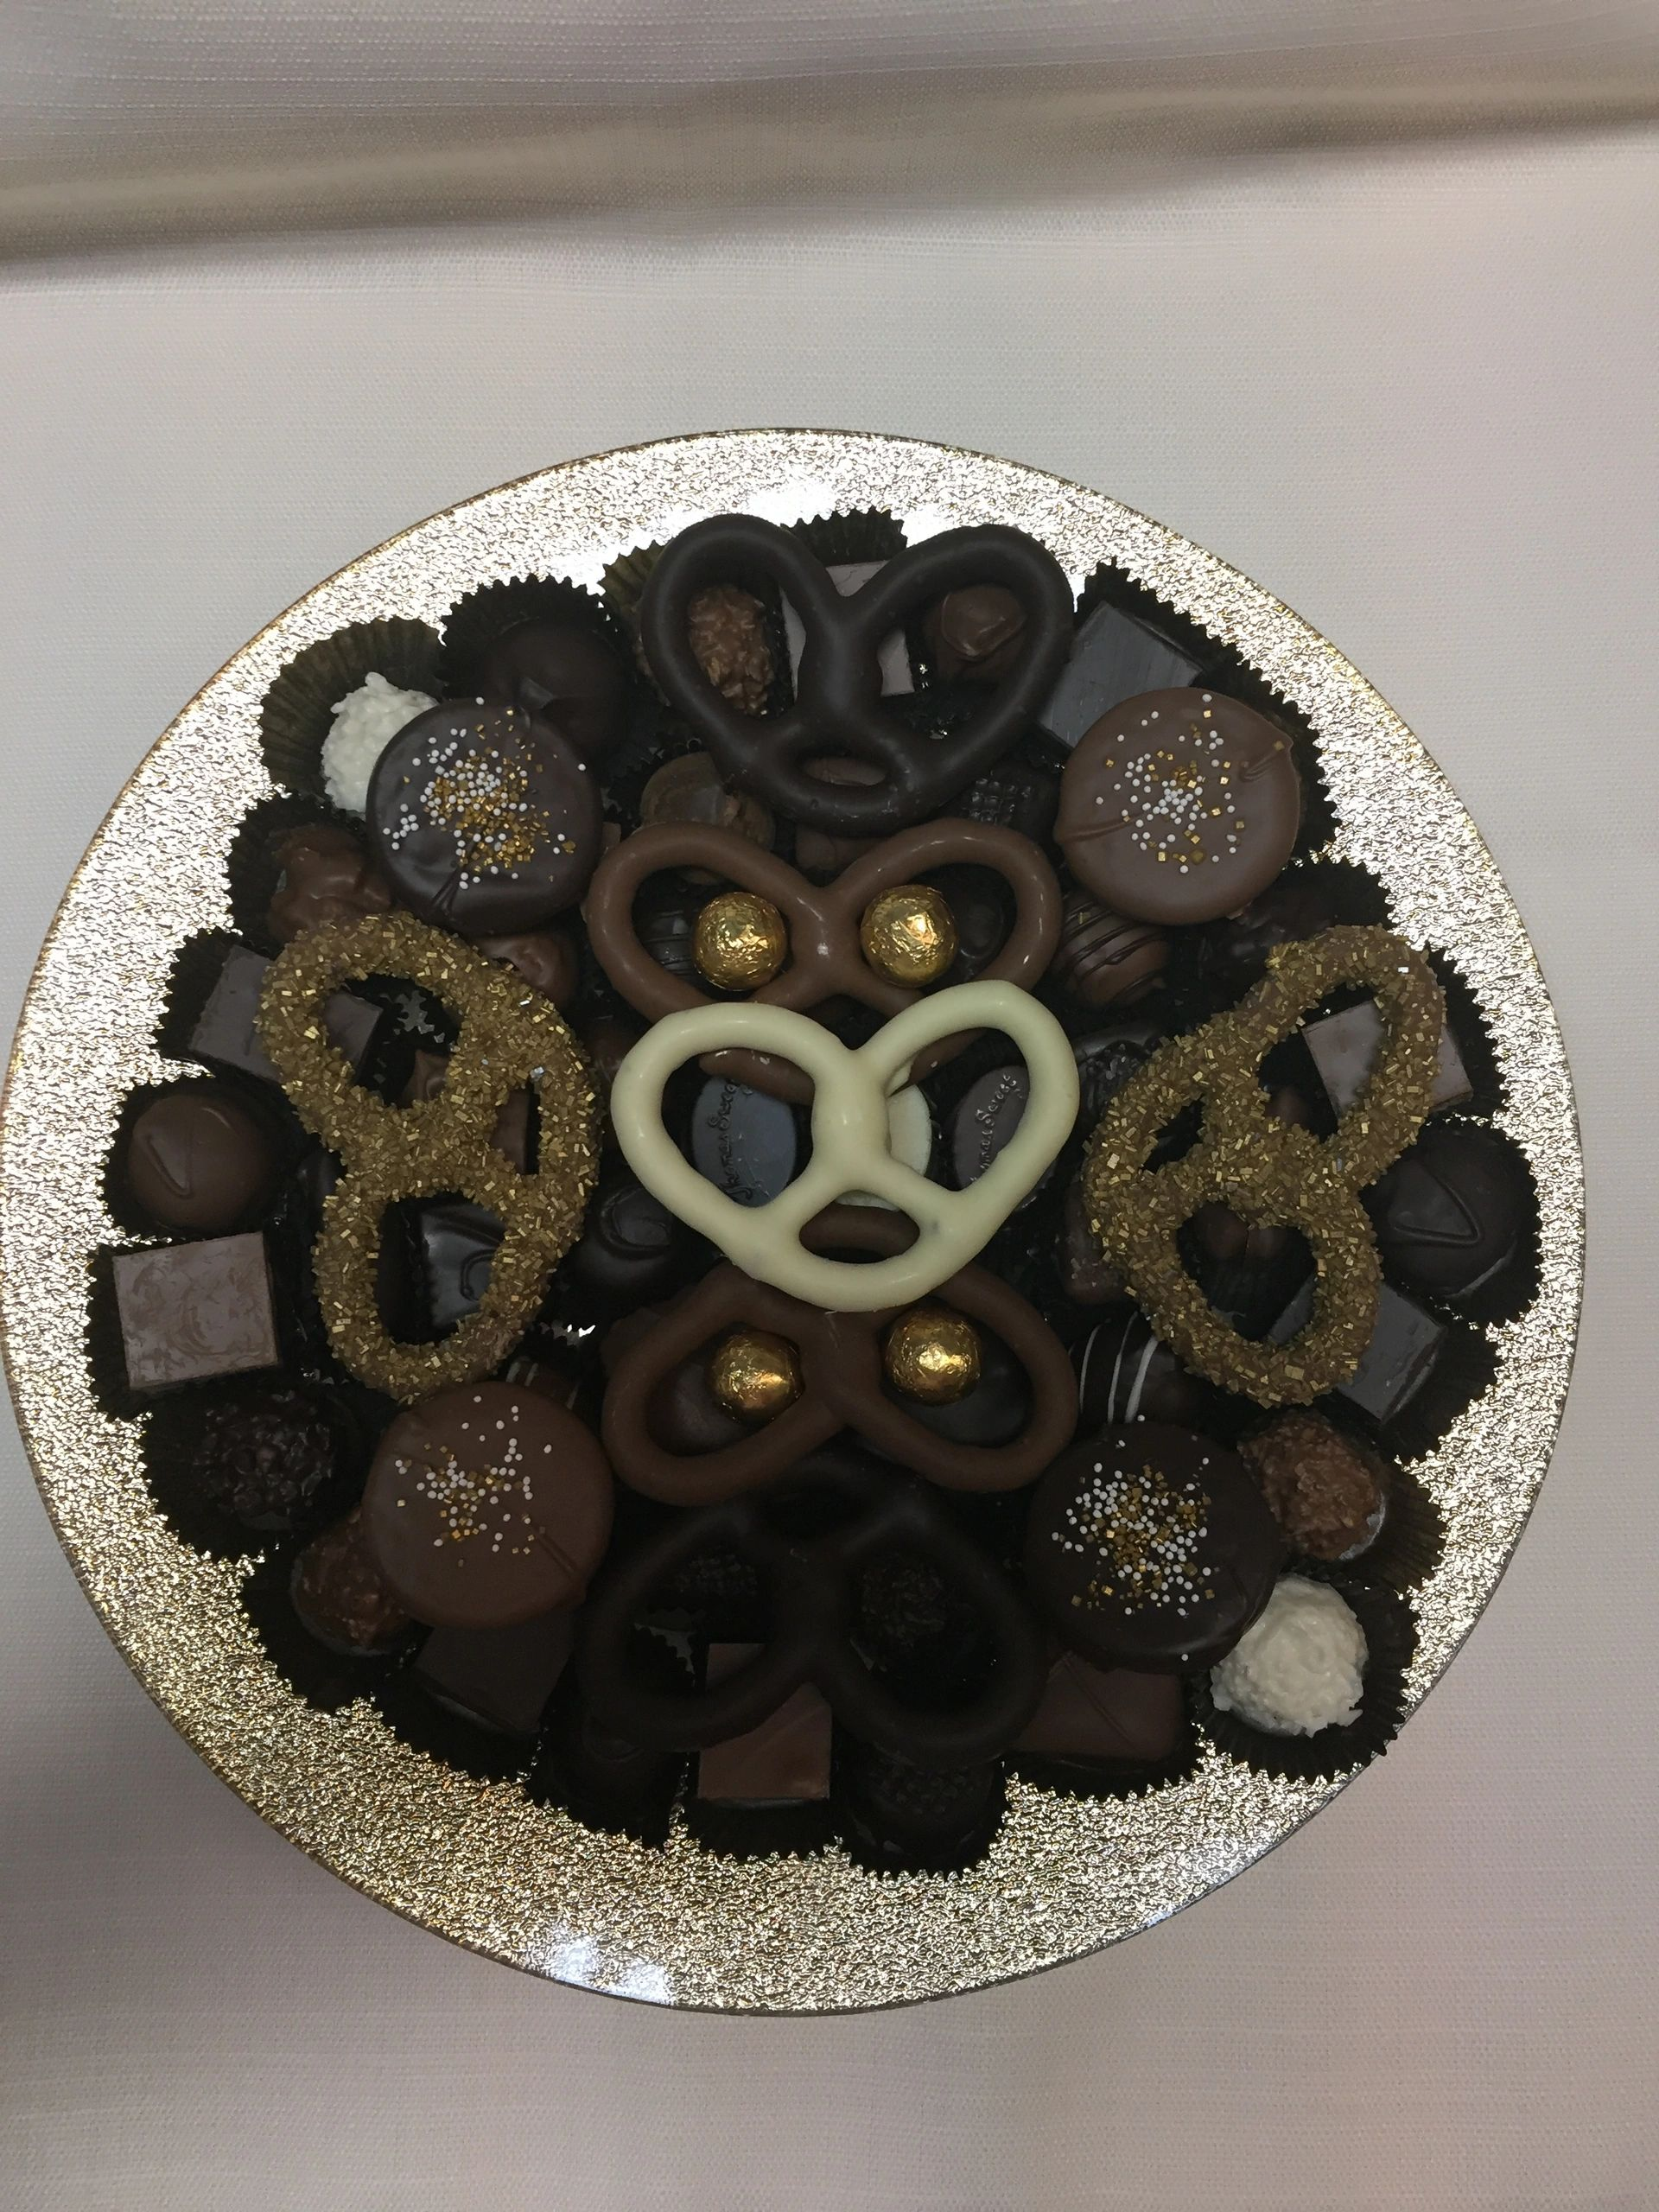 Thomas Sweet Ice Cream And Chocolates